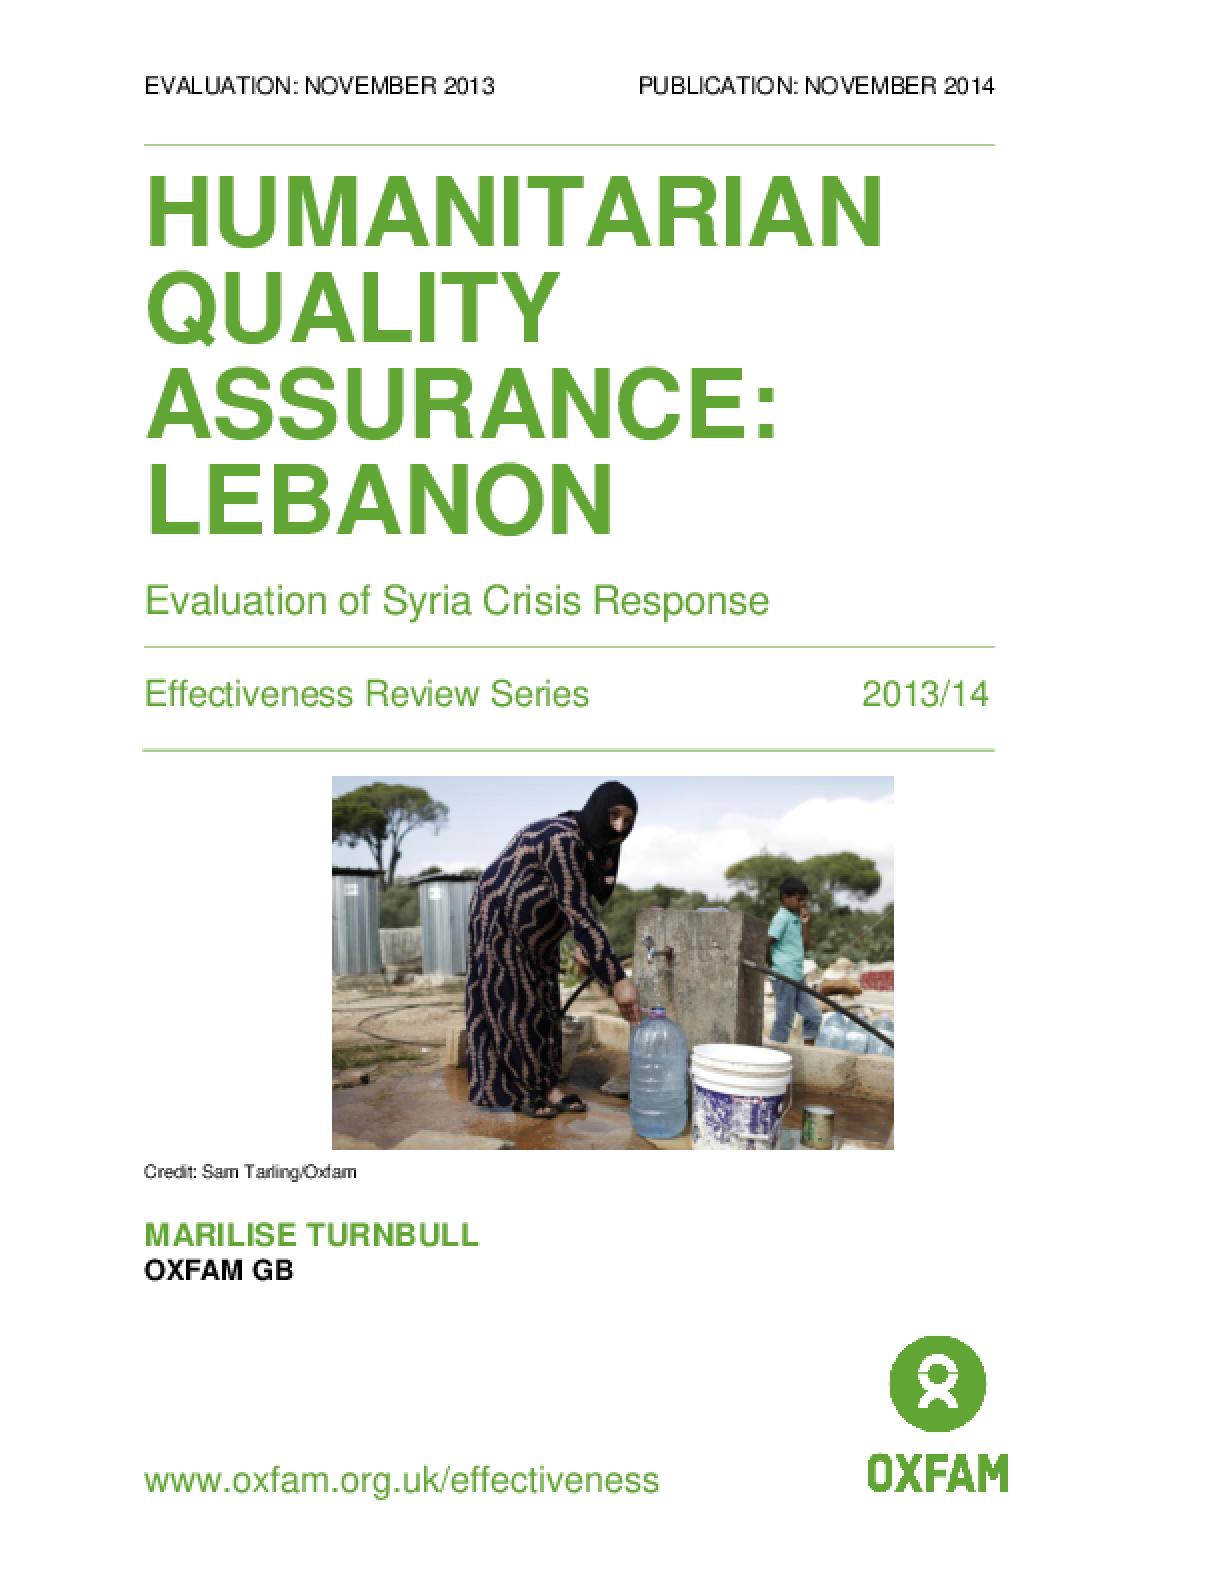 Humanitarian Quality Assurance - Lebanon: Evaluation of Syria crisis response